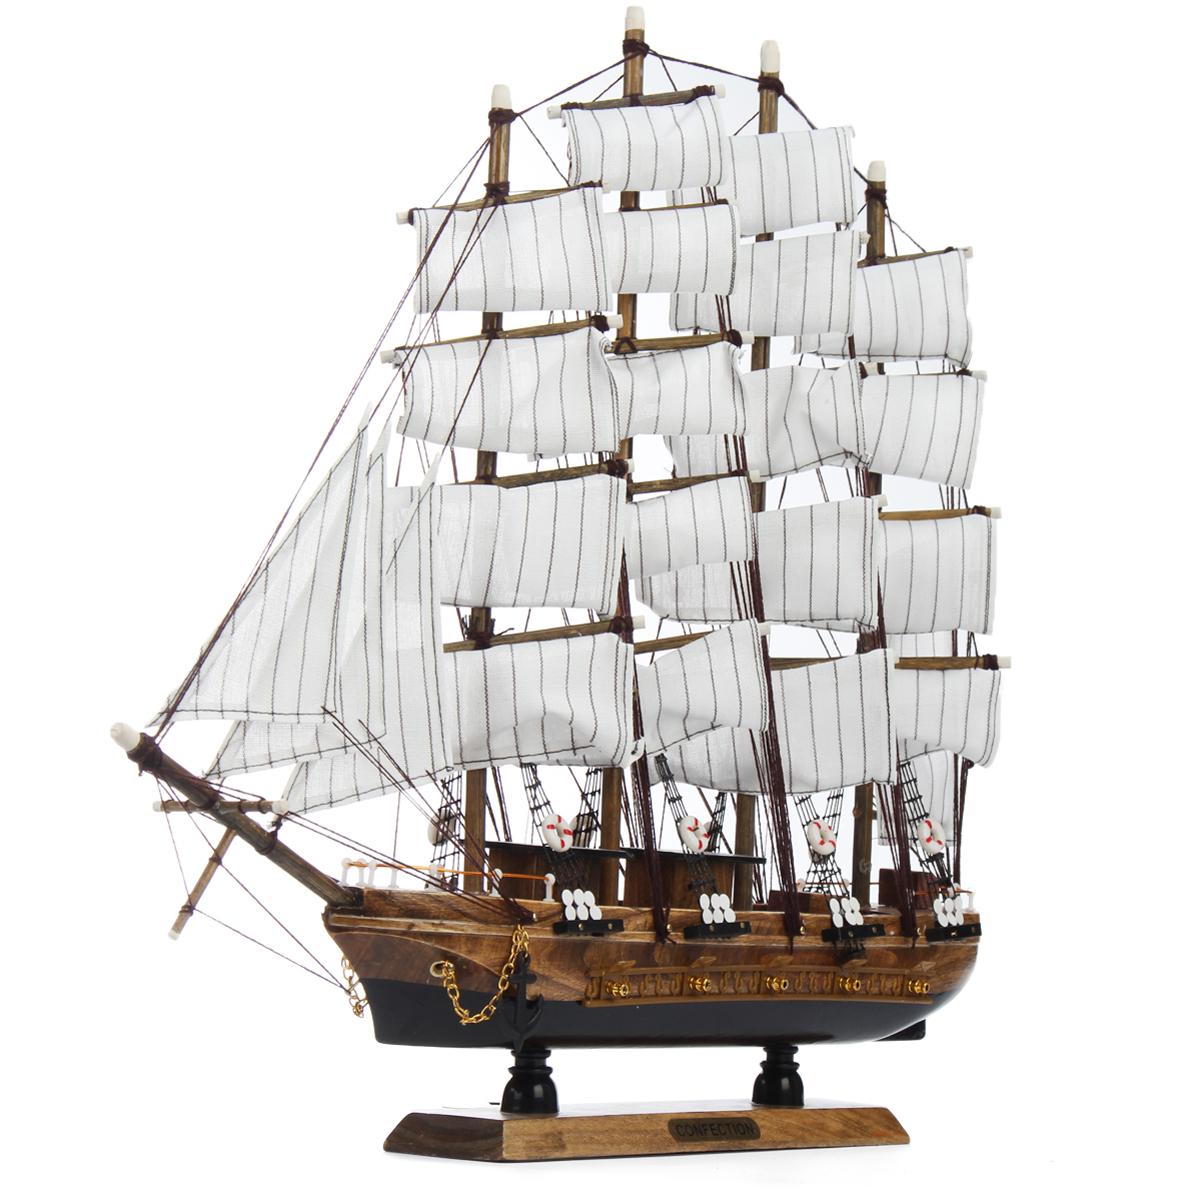 50cm Handmade Wooden Sailing Boats Model Assembly Nautical Ship Schooner Boat Decorations Gift